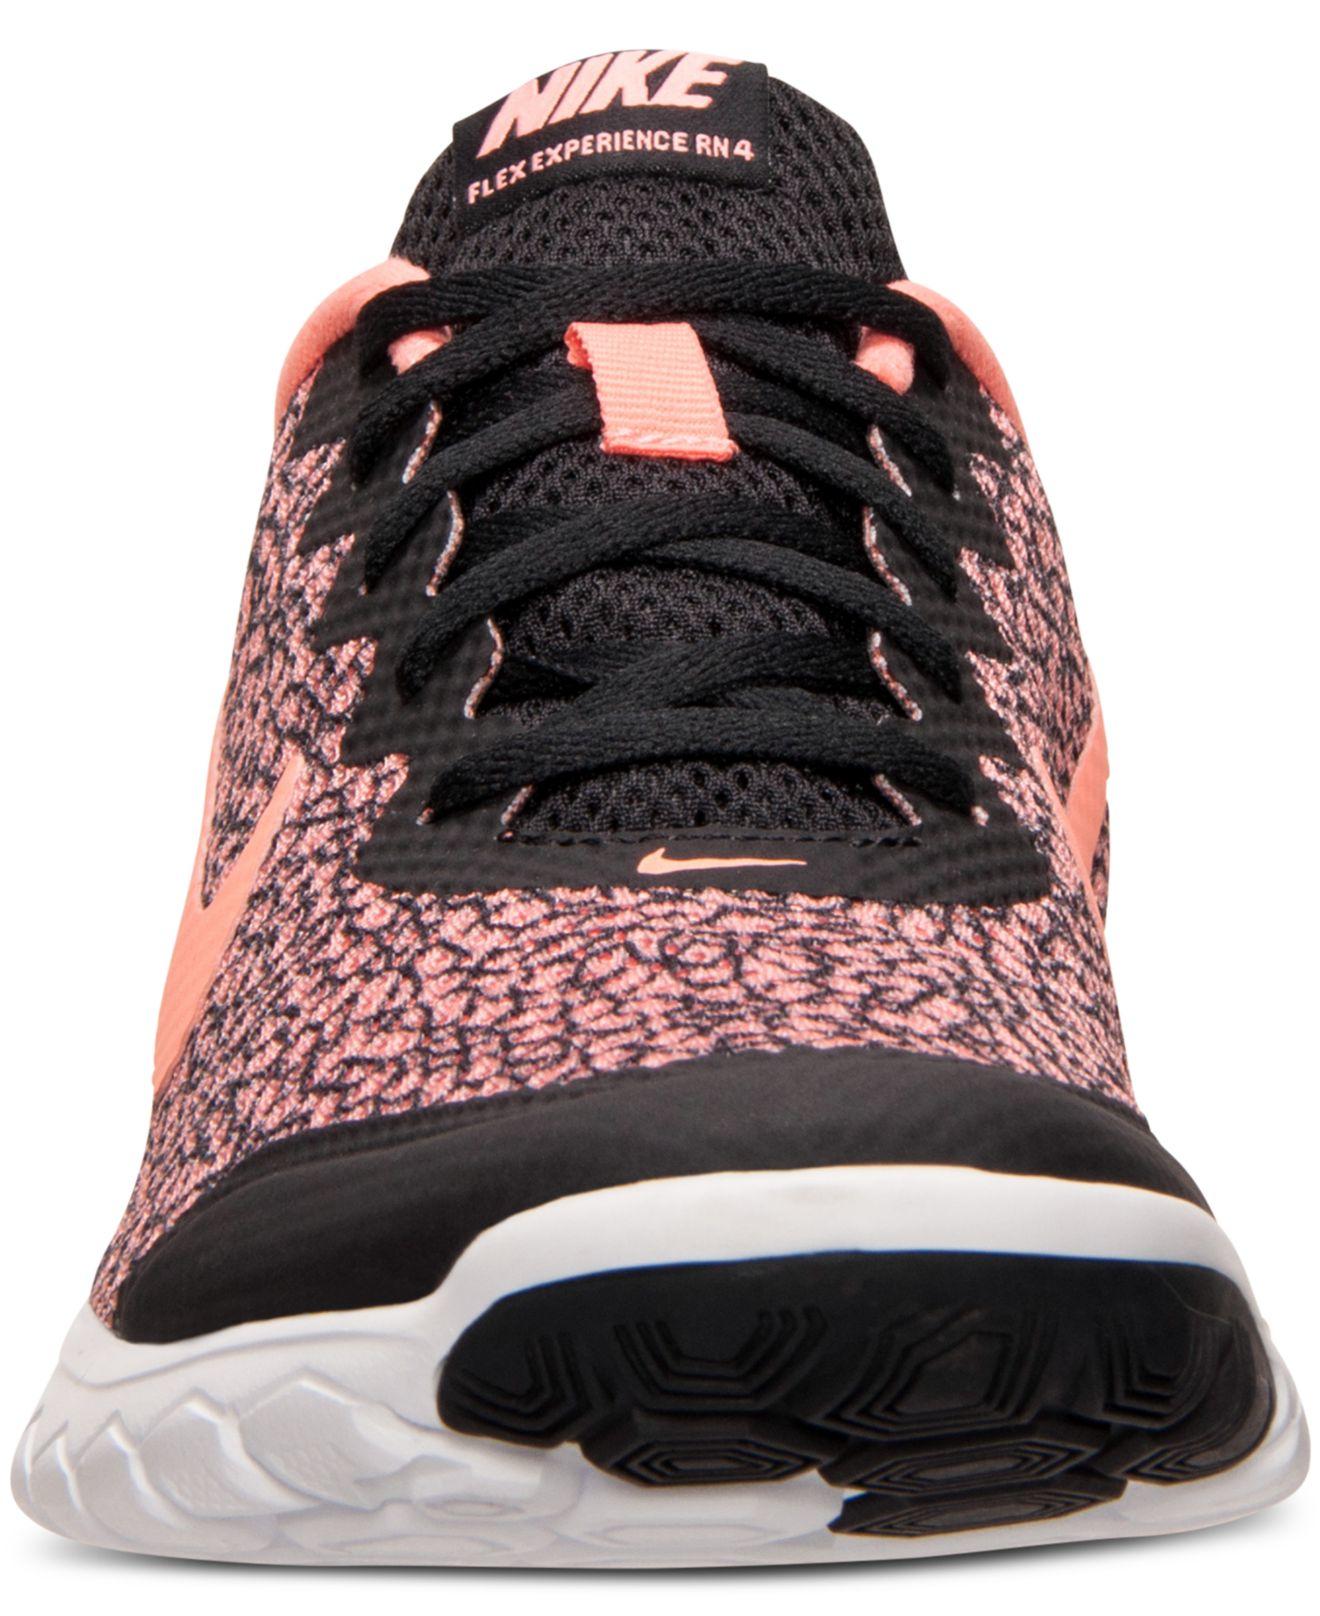 6b1cdff248355 Lyst - Nike Women s Flex Experience Run 4 Premium Running Sneakers ...